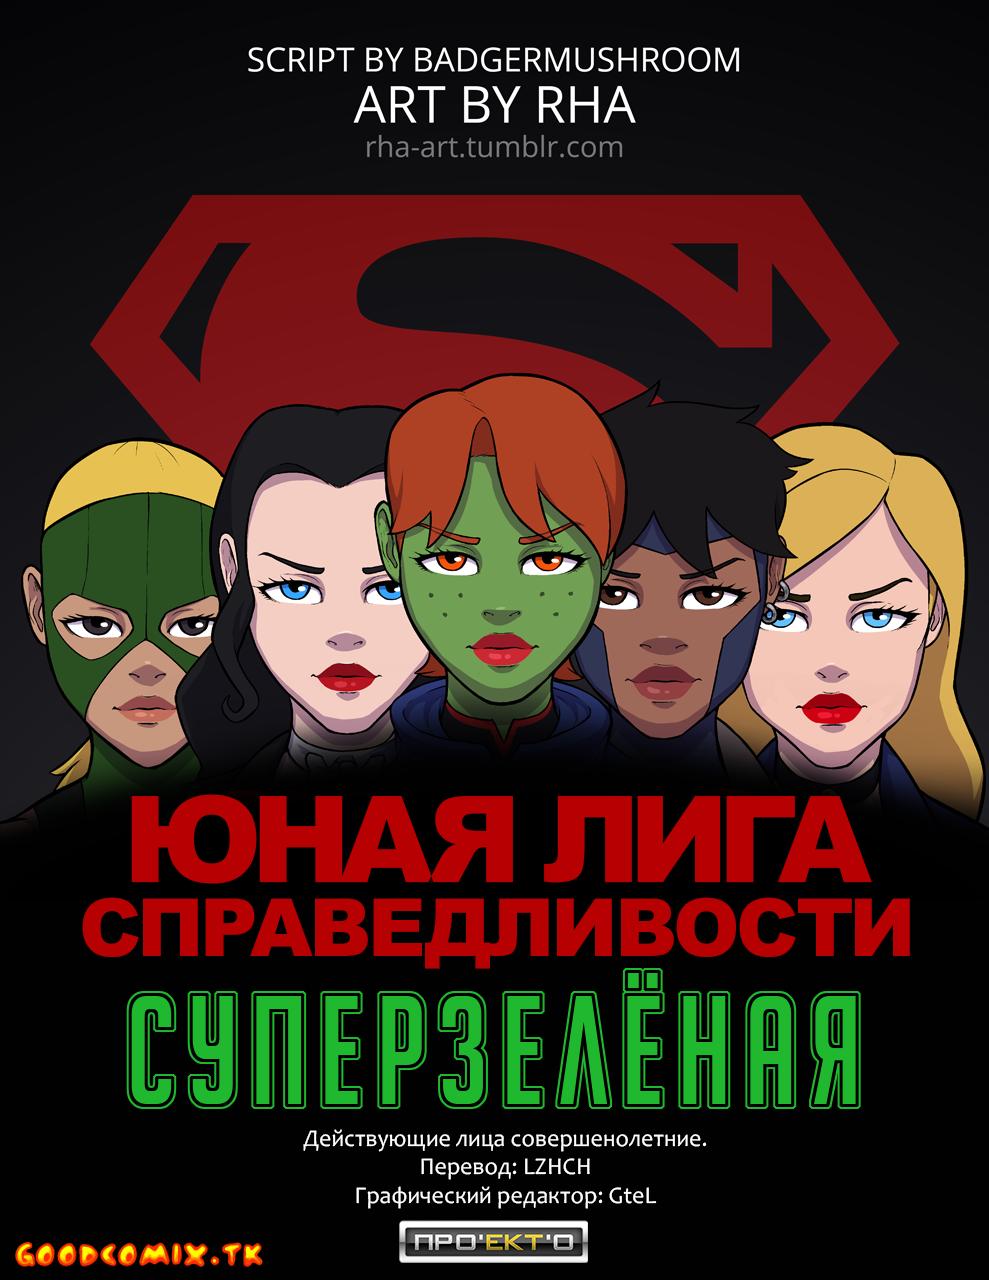 Goodcomix Young Justice - [RHA] - Supergreen